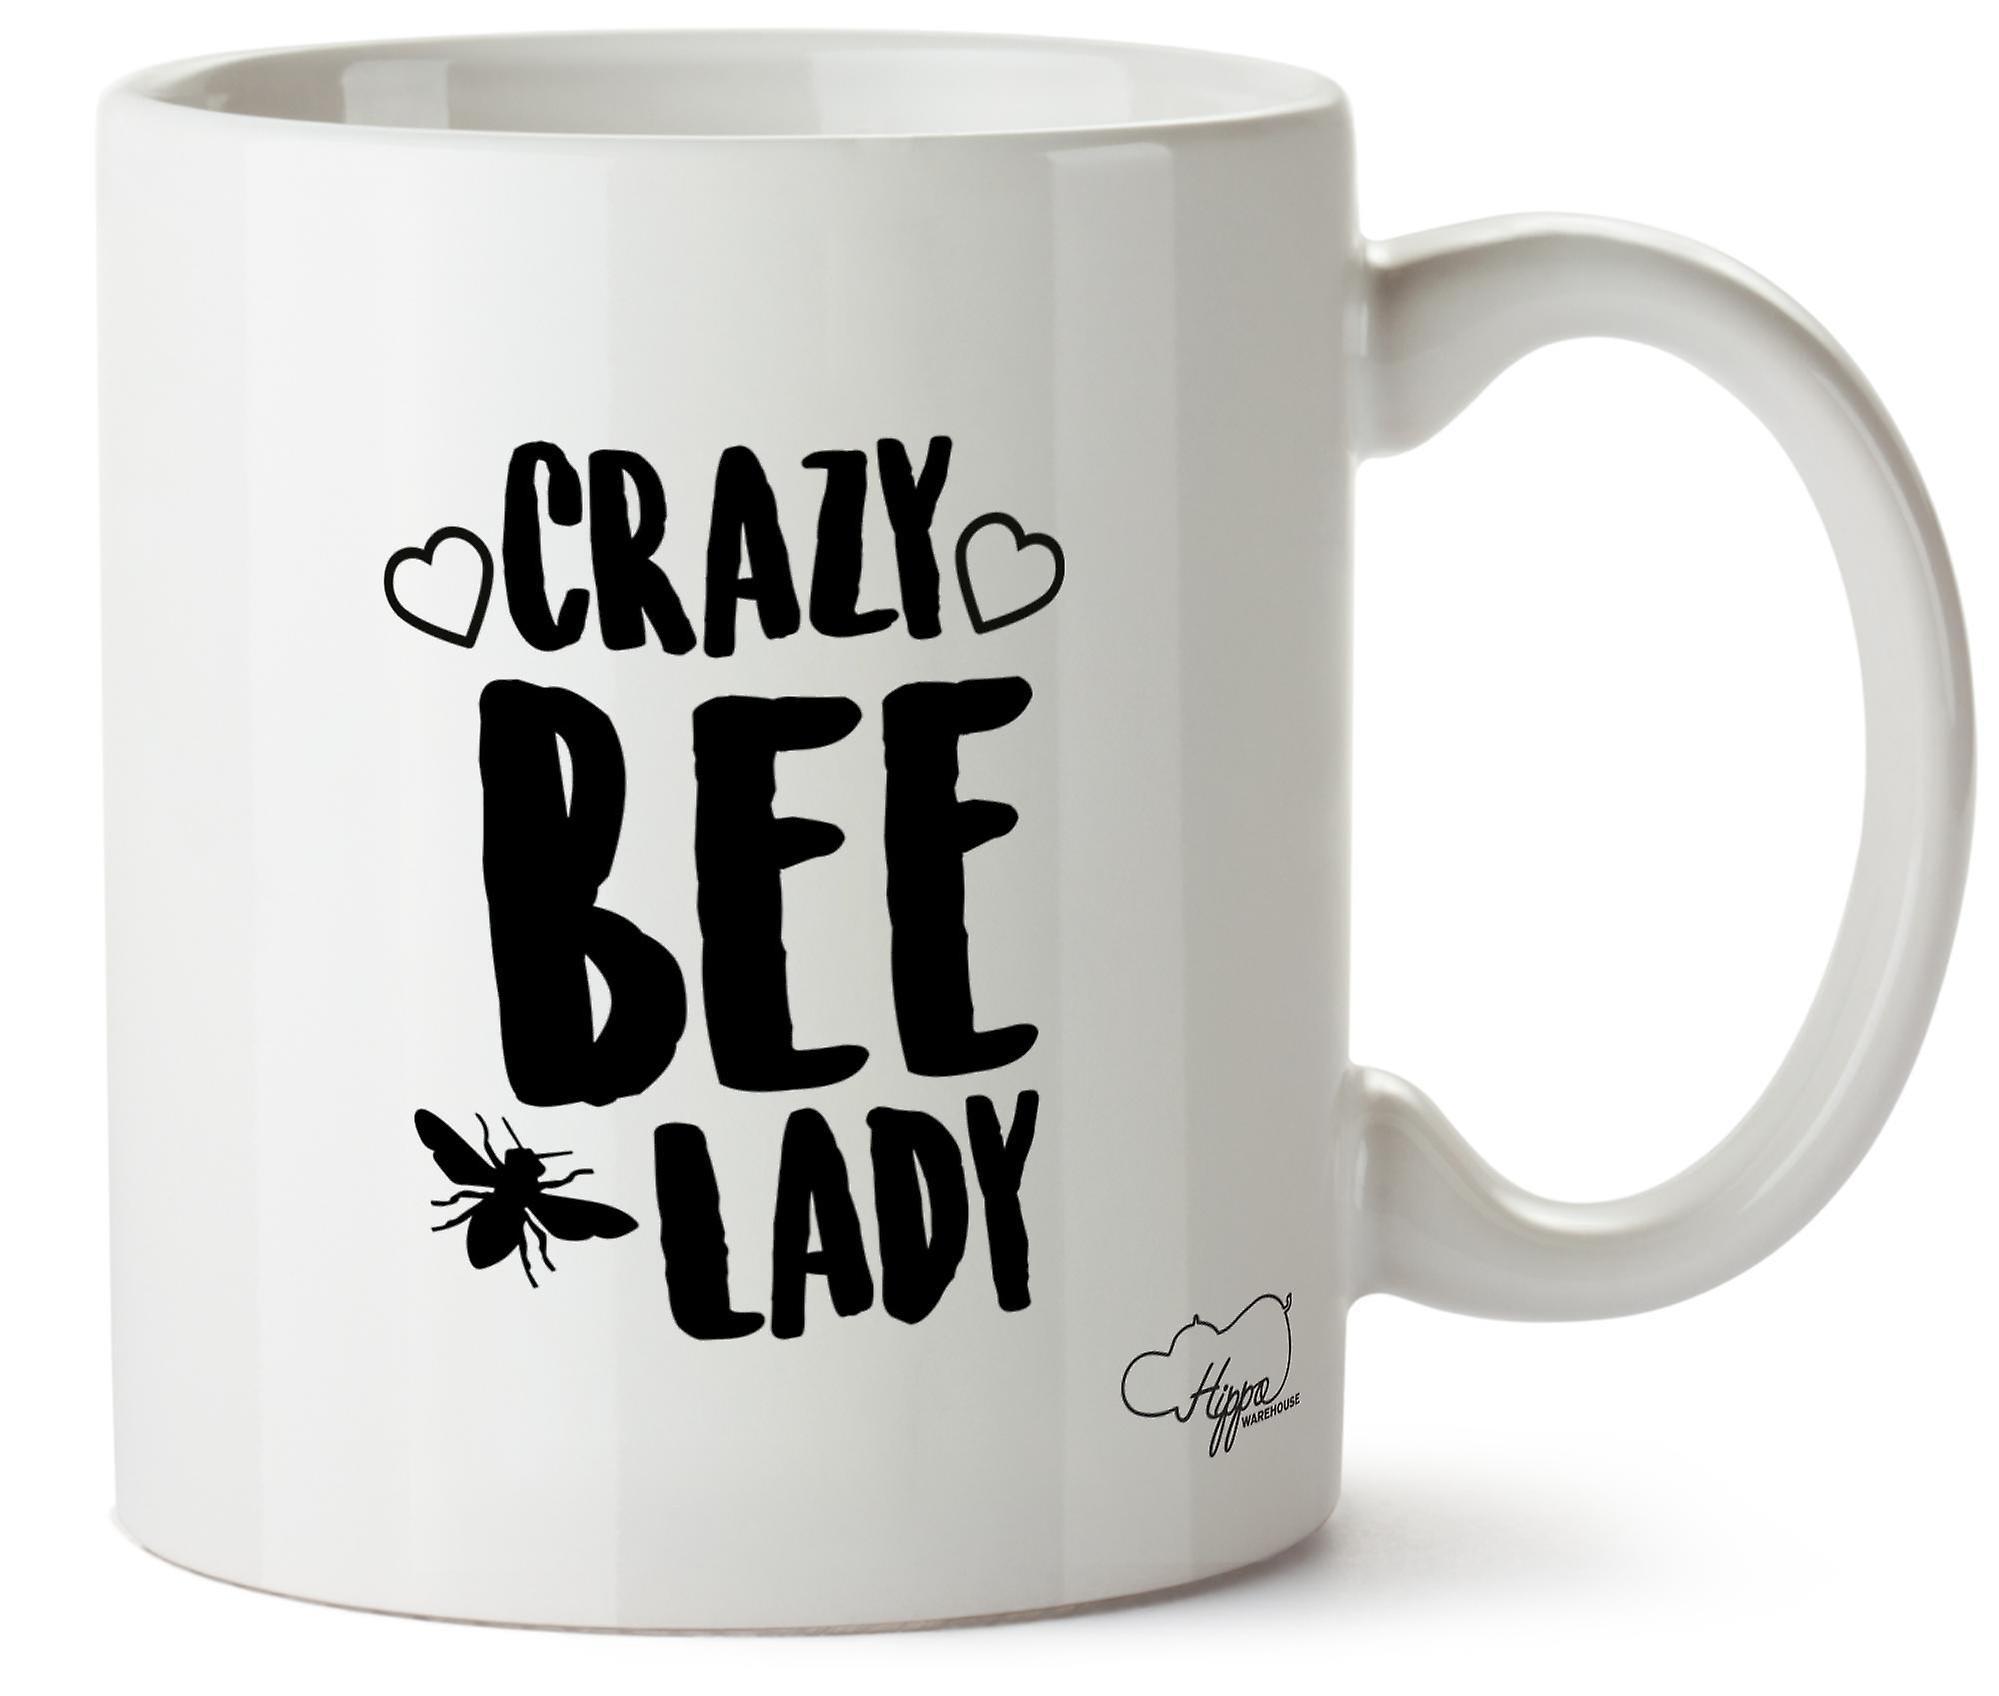 Hippowarehouse Crazy Bee Lady Printed Mug Cup Ceramic 10oz